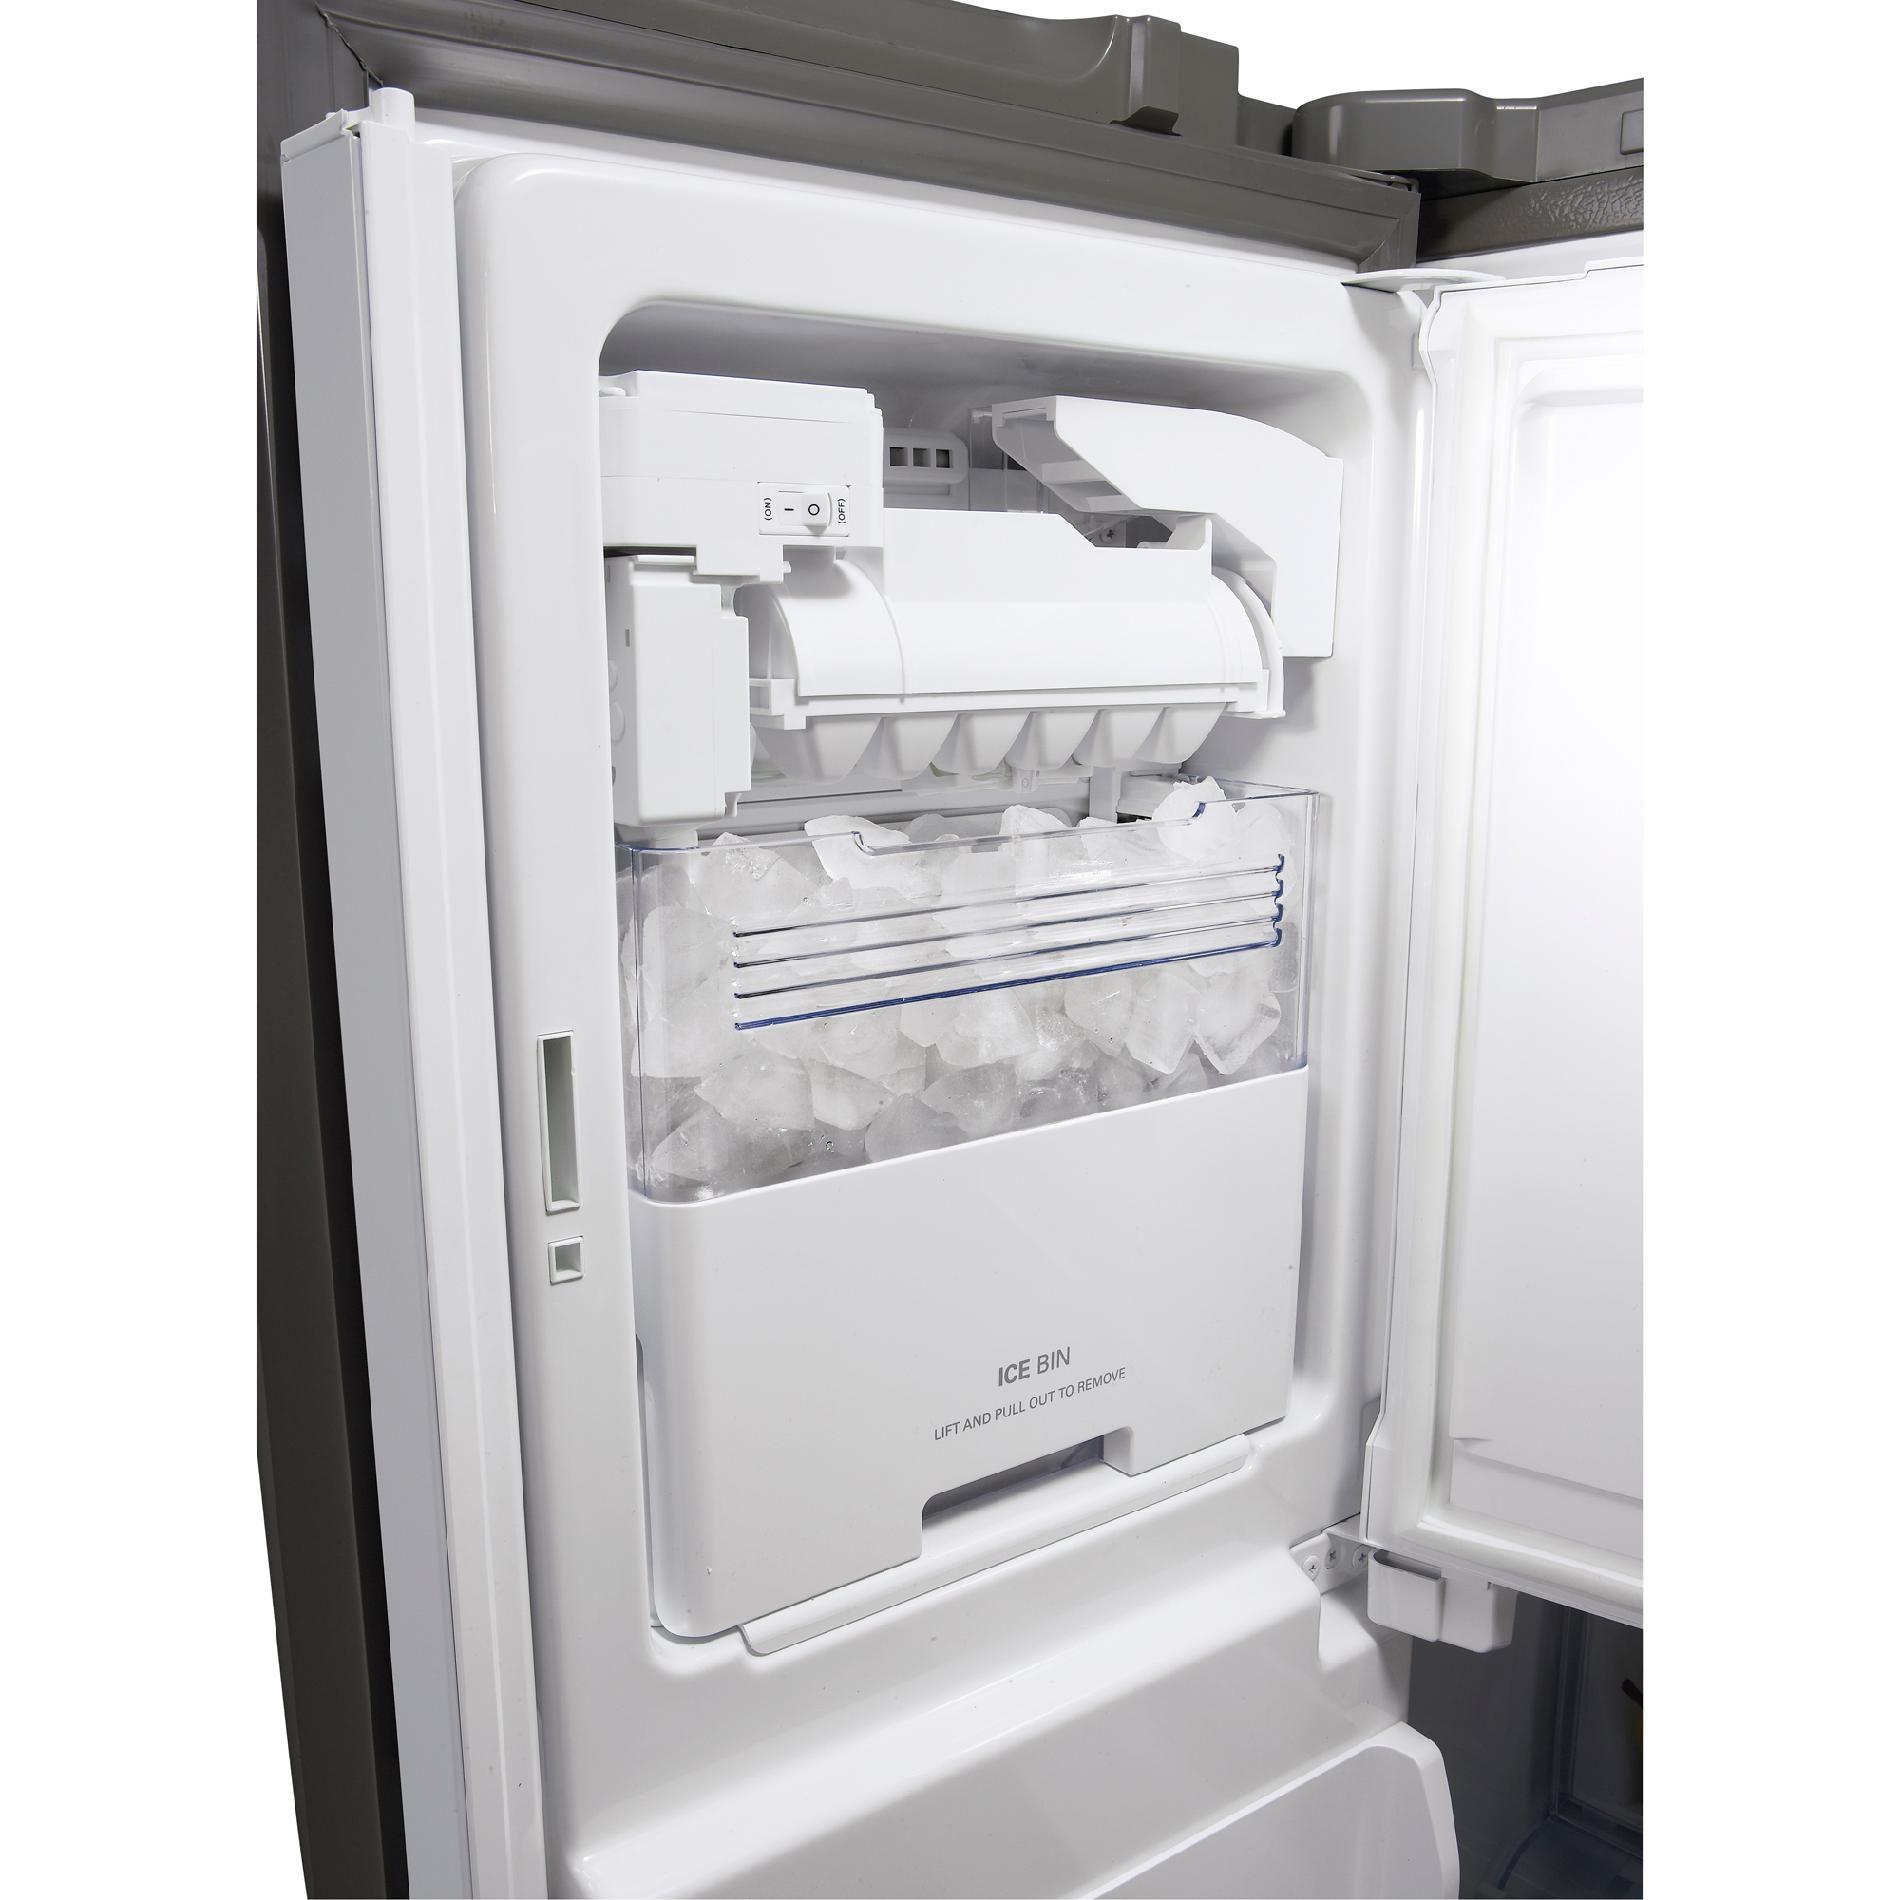 LG 24.7 cu. ft. French-Door Bottom-Freezer Refrigerator - Stainless Steel